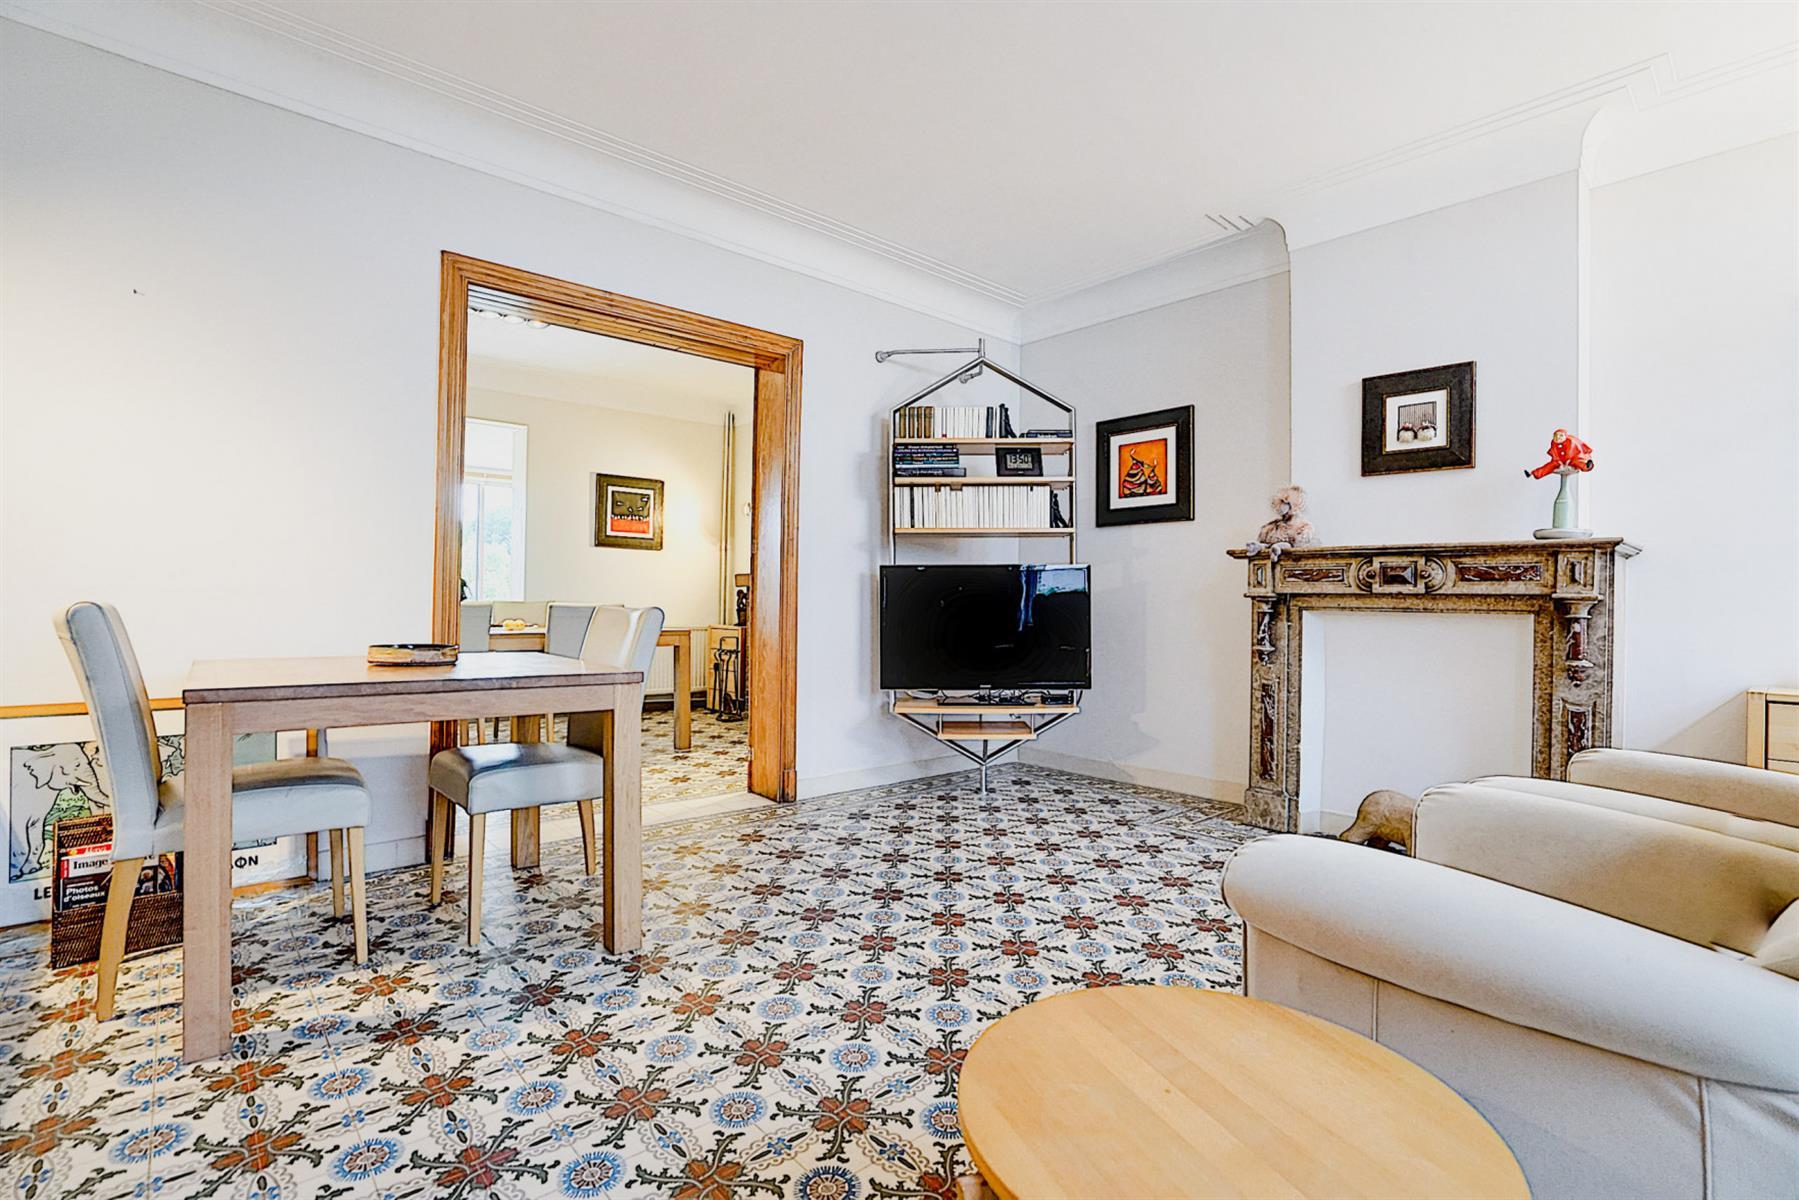 Maison - Bousval - #4395358-6